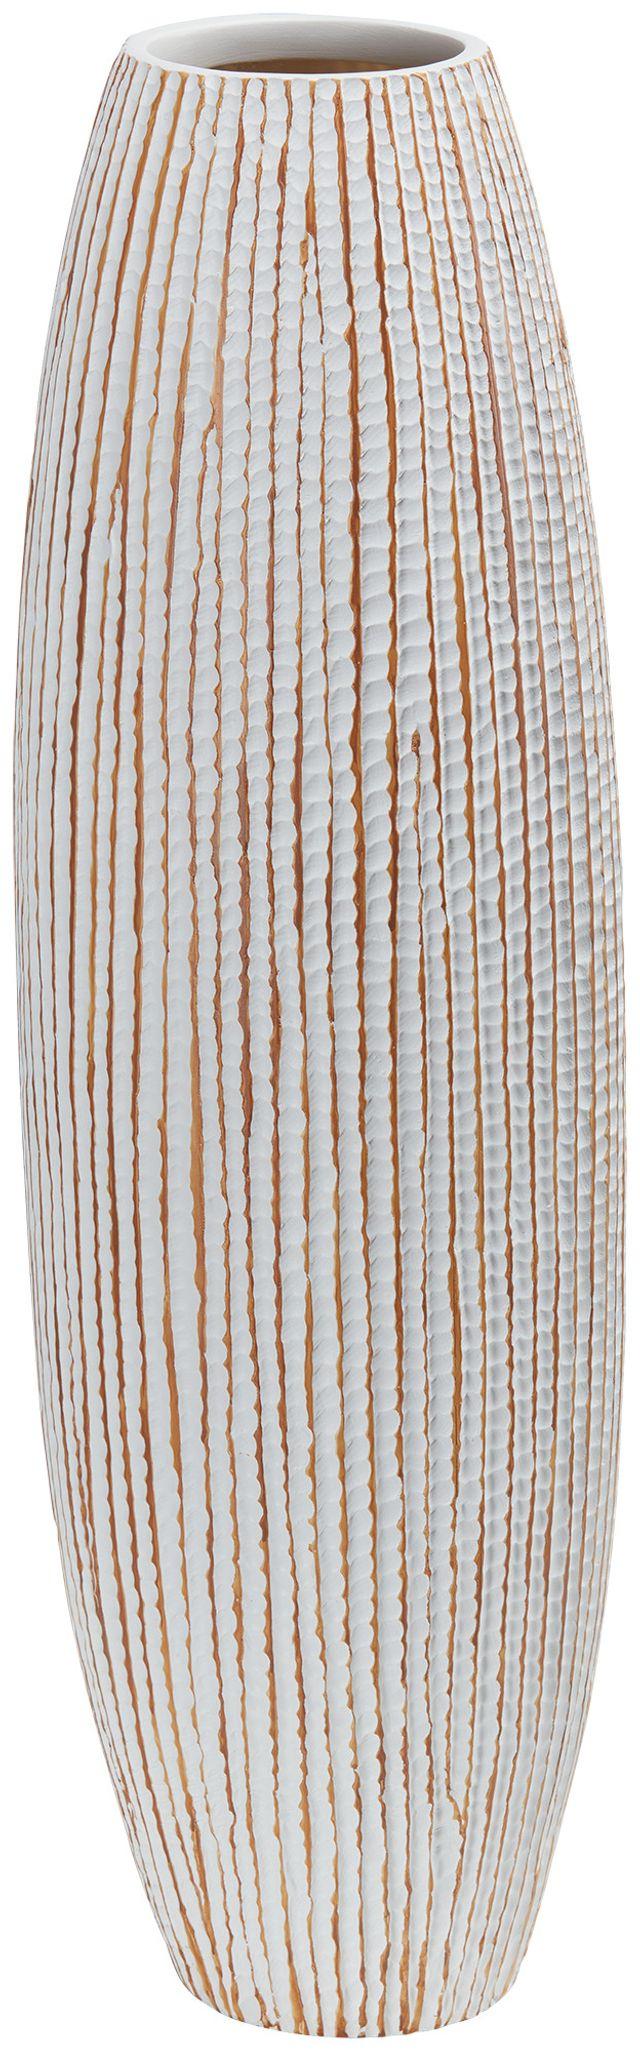 Harper Beige Vase (1)